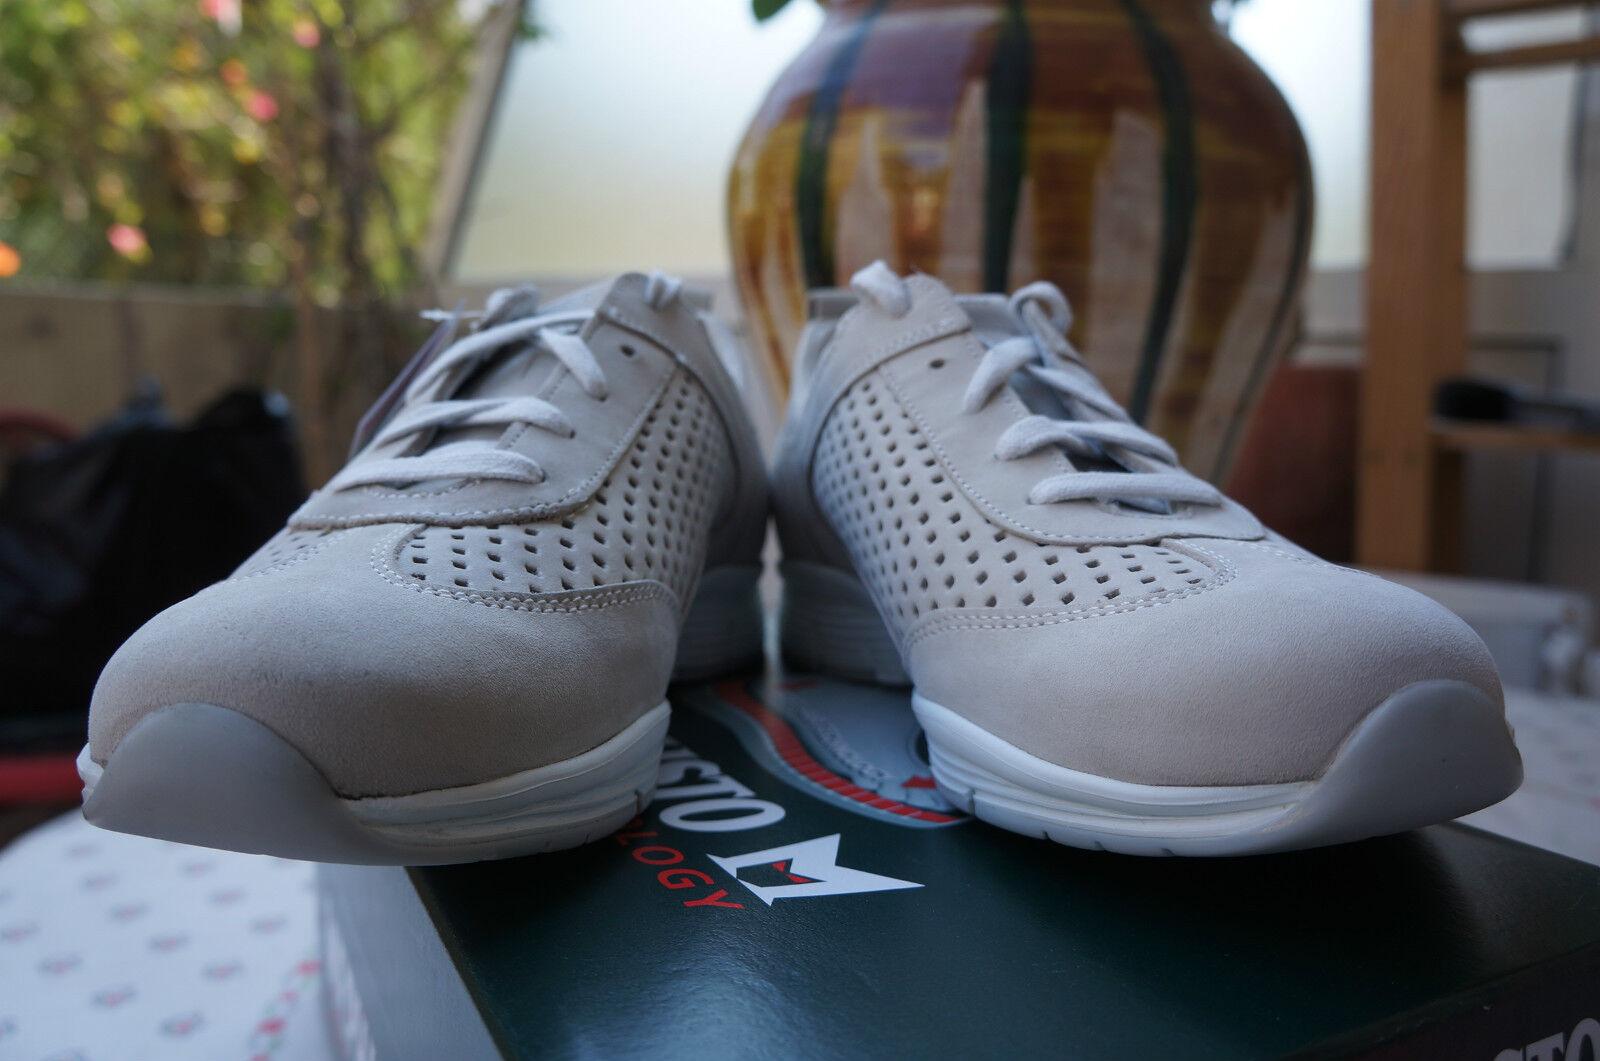 Mephisto YOANA MAYA MAYA MAYA 834 FOG, Damen Sneakers, Elfenbein , 38 EU (5  UK) 7.5 US- 281597